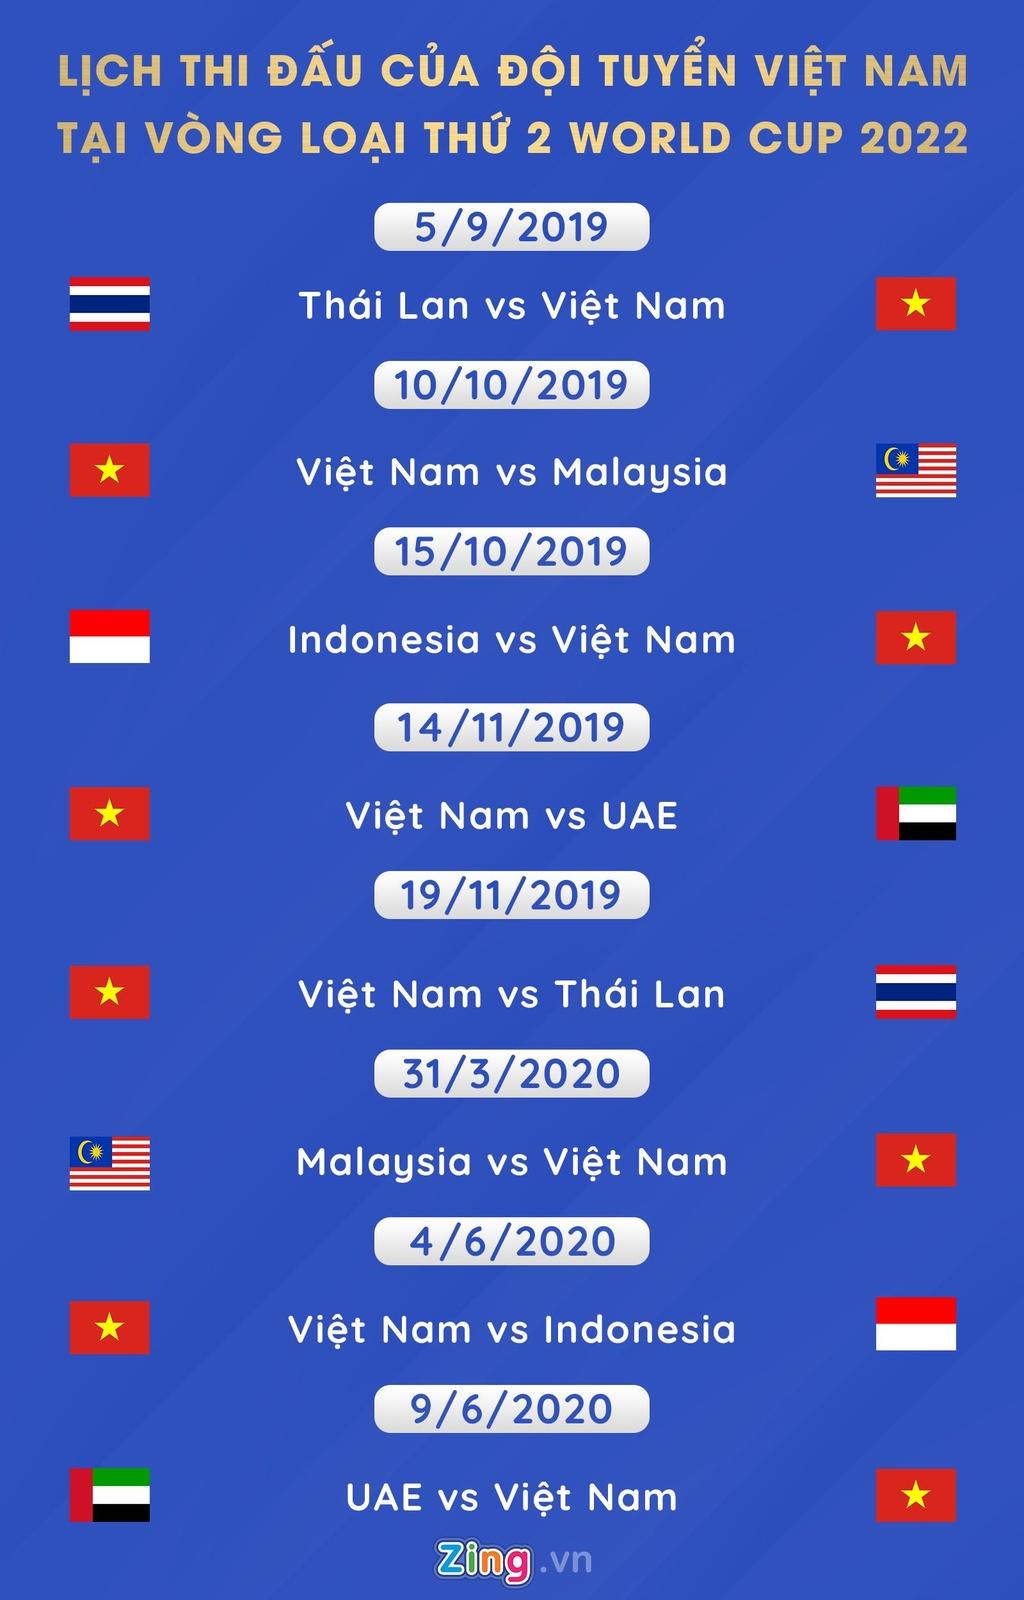 Tuyen Viet Nam roi vao bang dau kho, khong co doi lot duong hinh anh 3